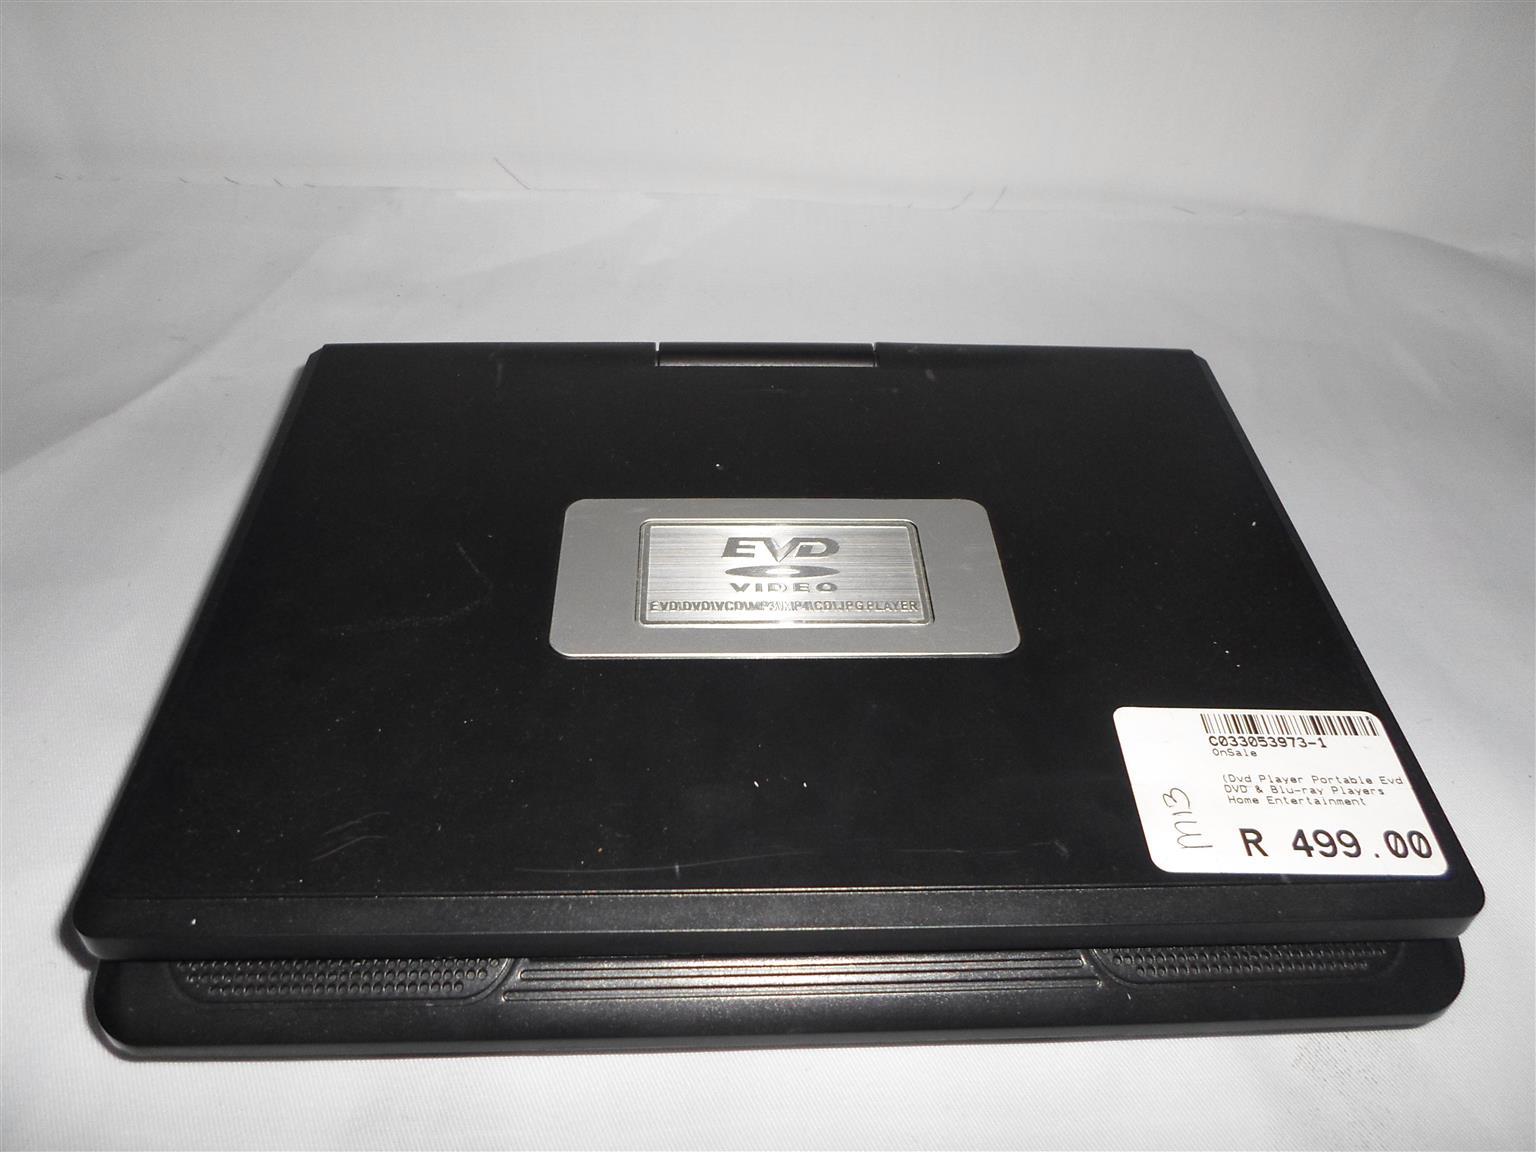 EVD Video Portable DVD Player